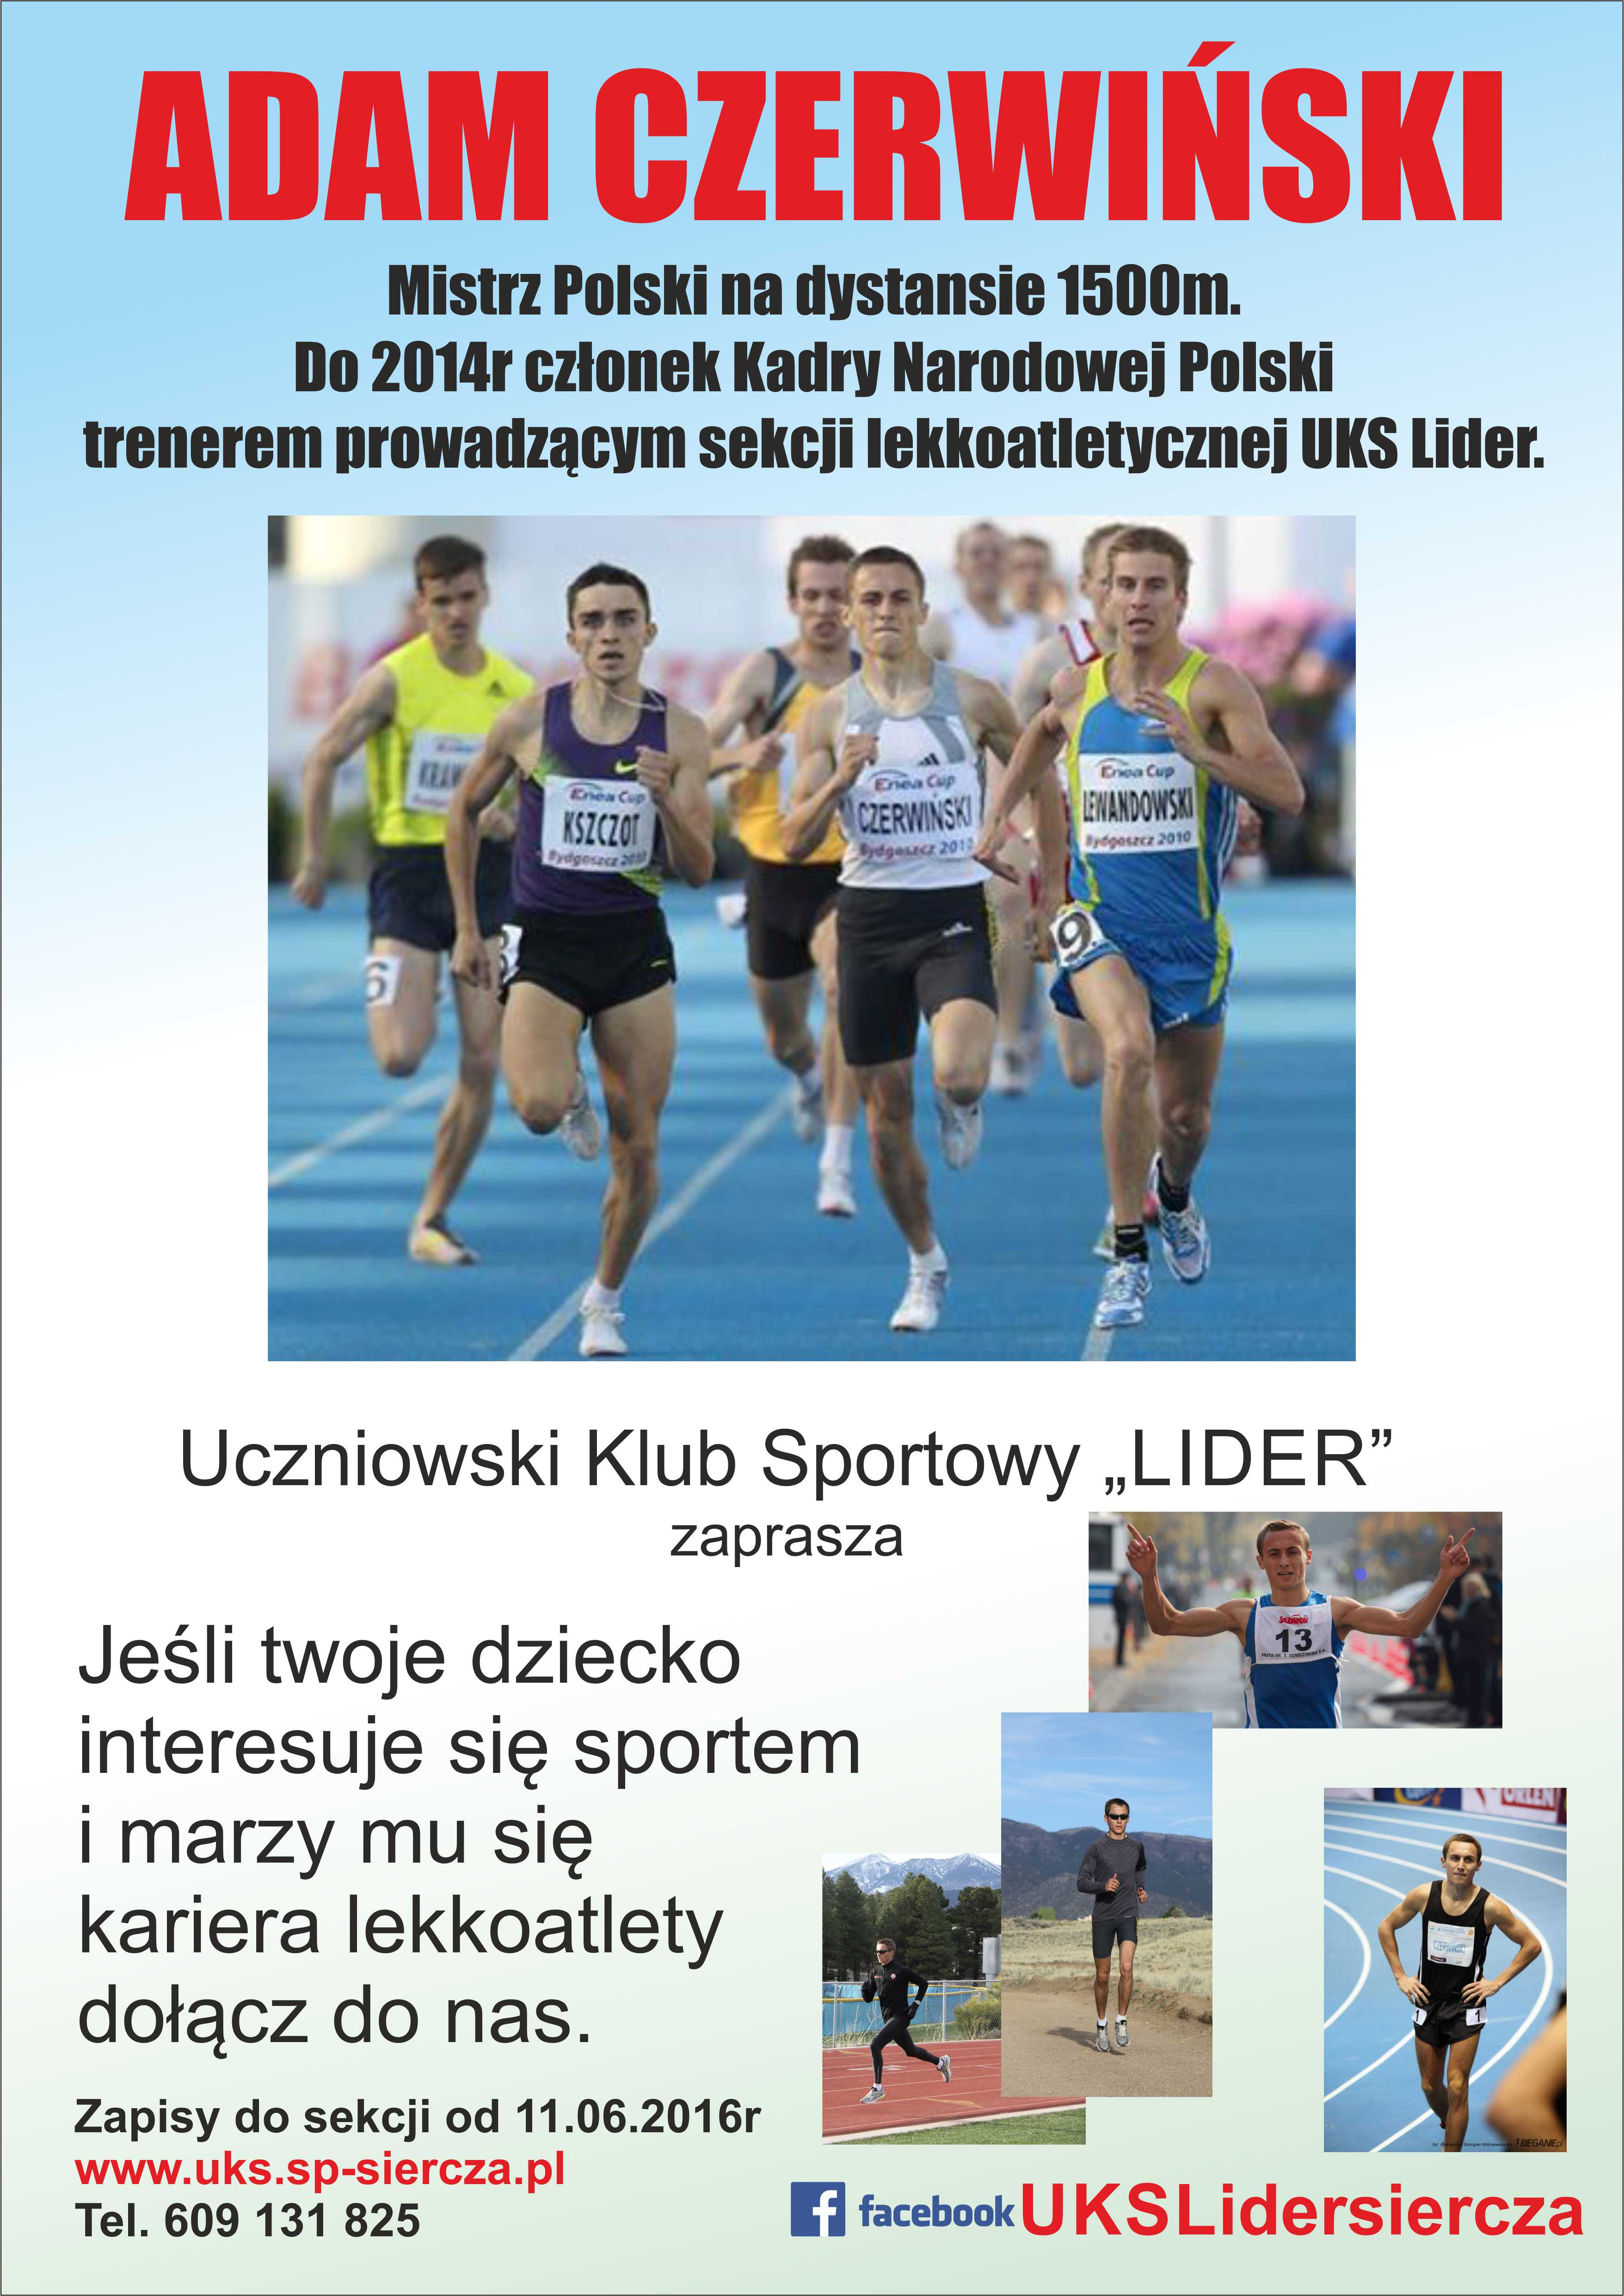 plakat a3 - bieganie(2) (1)